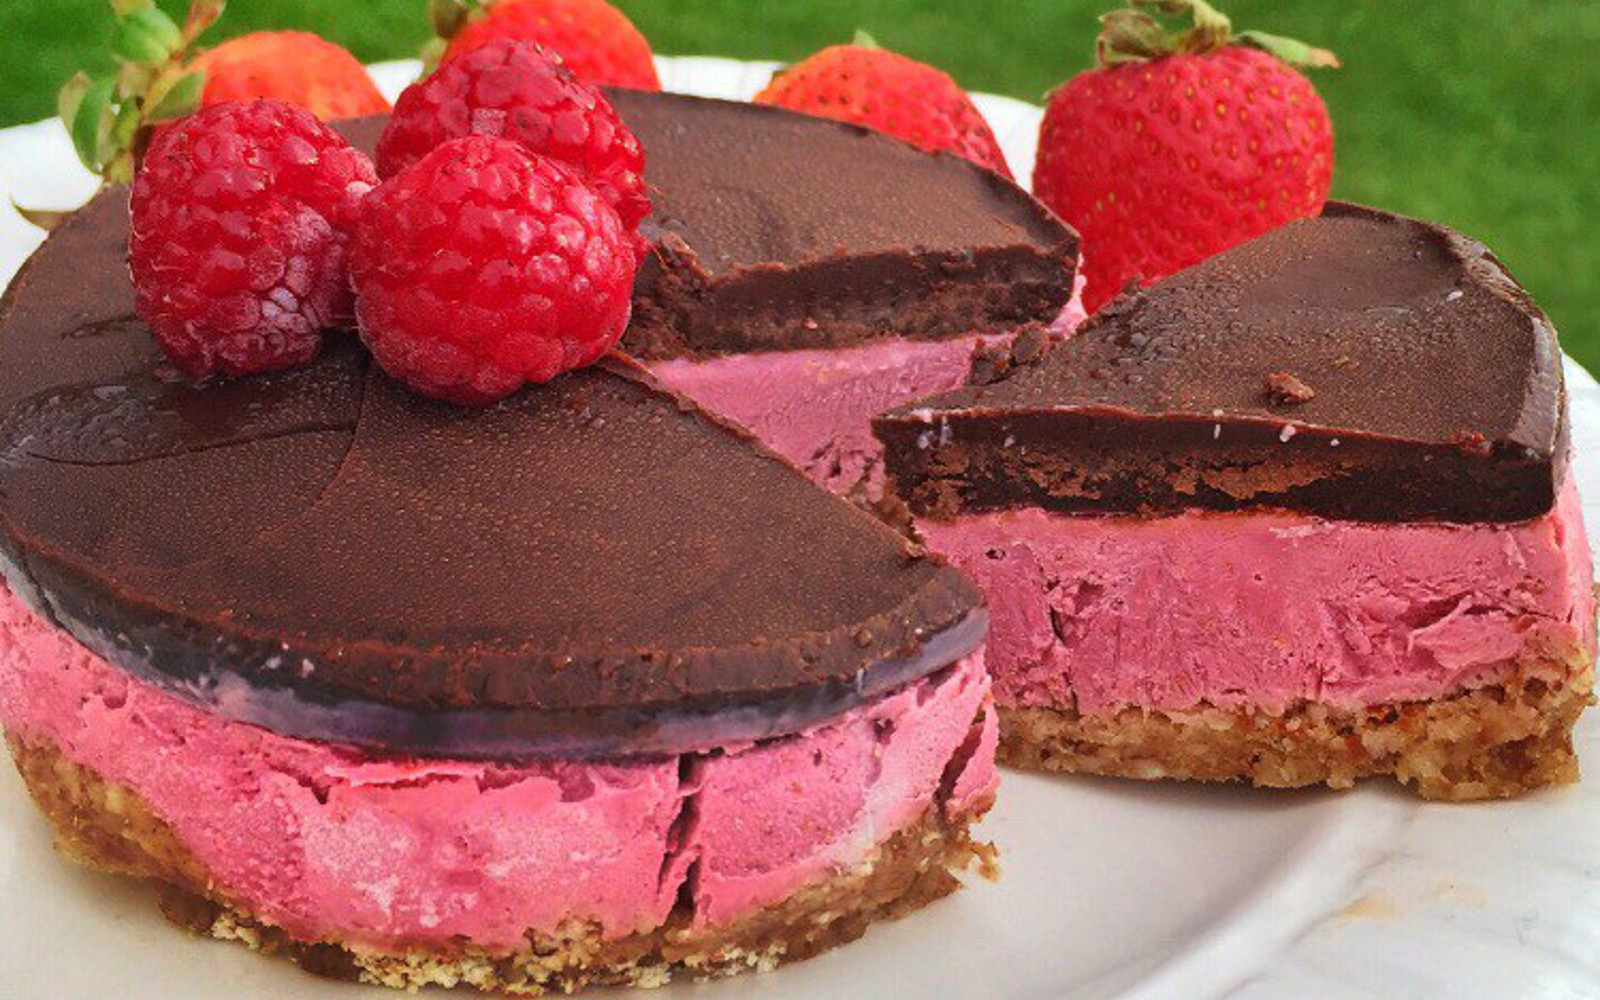 Chocolate-Covered Raspberry Cheesecake